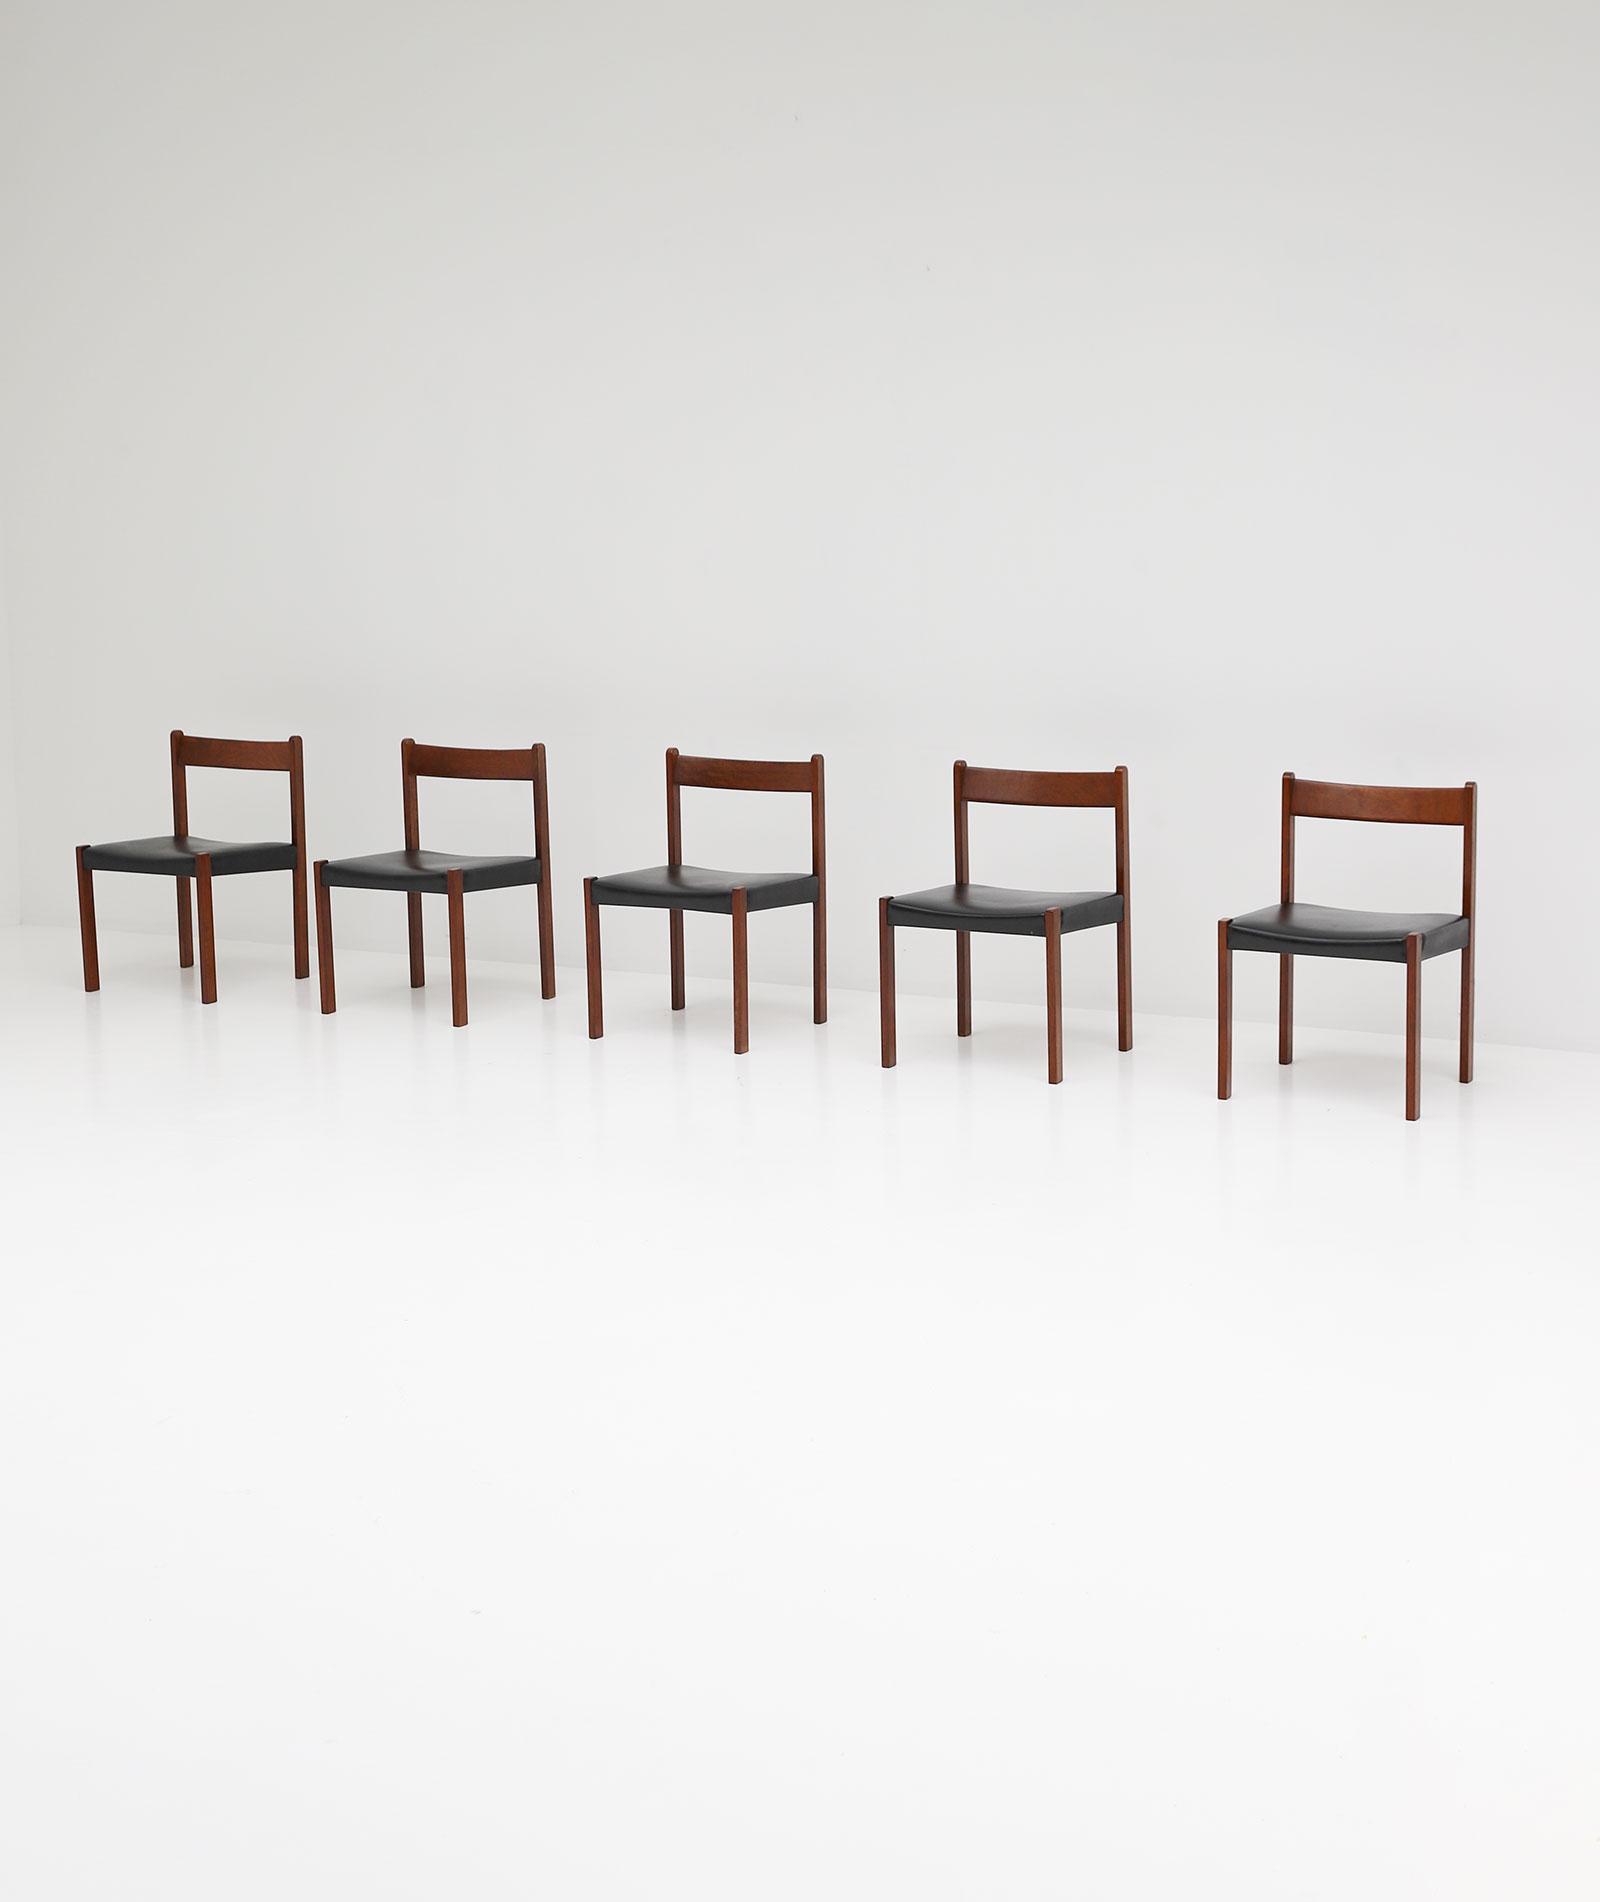 Alfred Hendrickx Belform Chairsimage 1